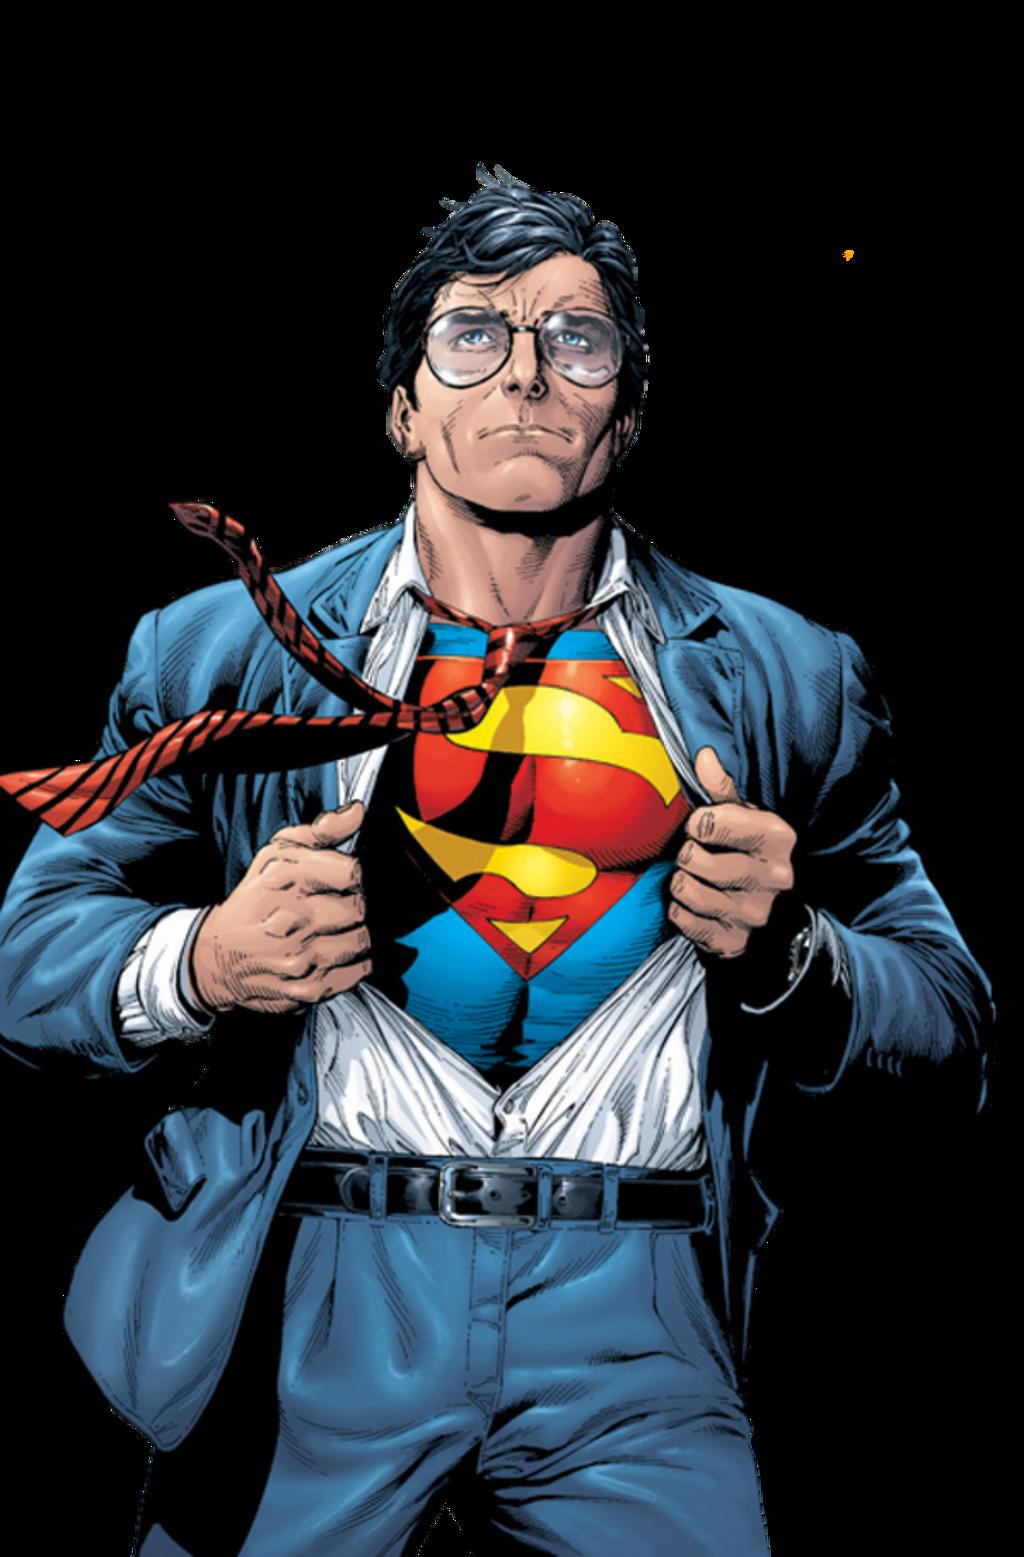 Clark Kent - Transparent by Asthonx1 on DeviantArt